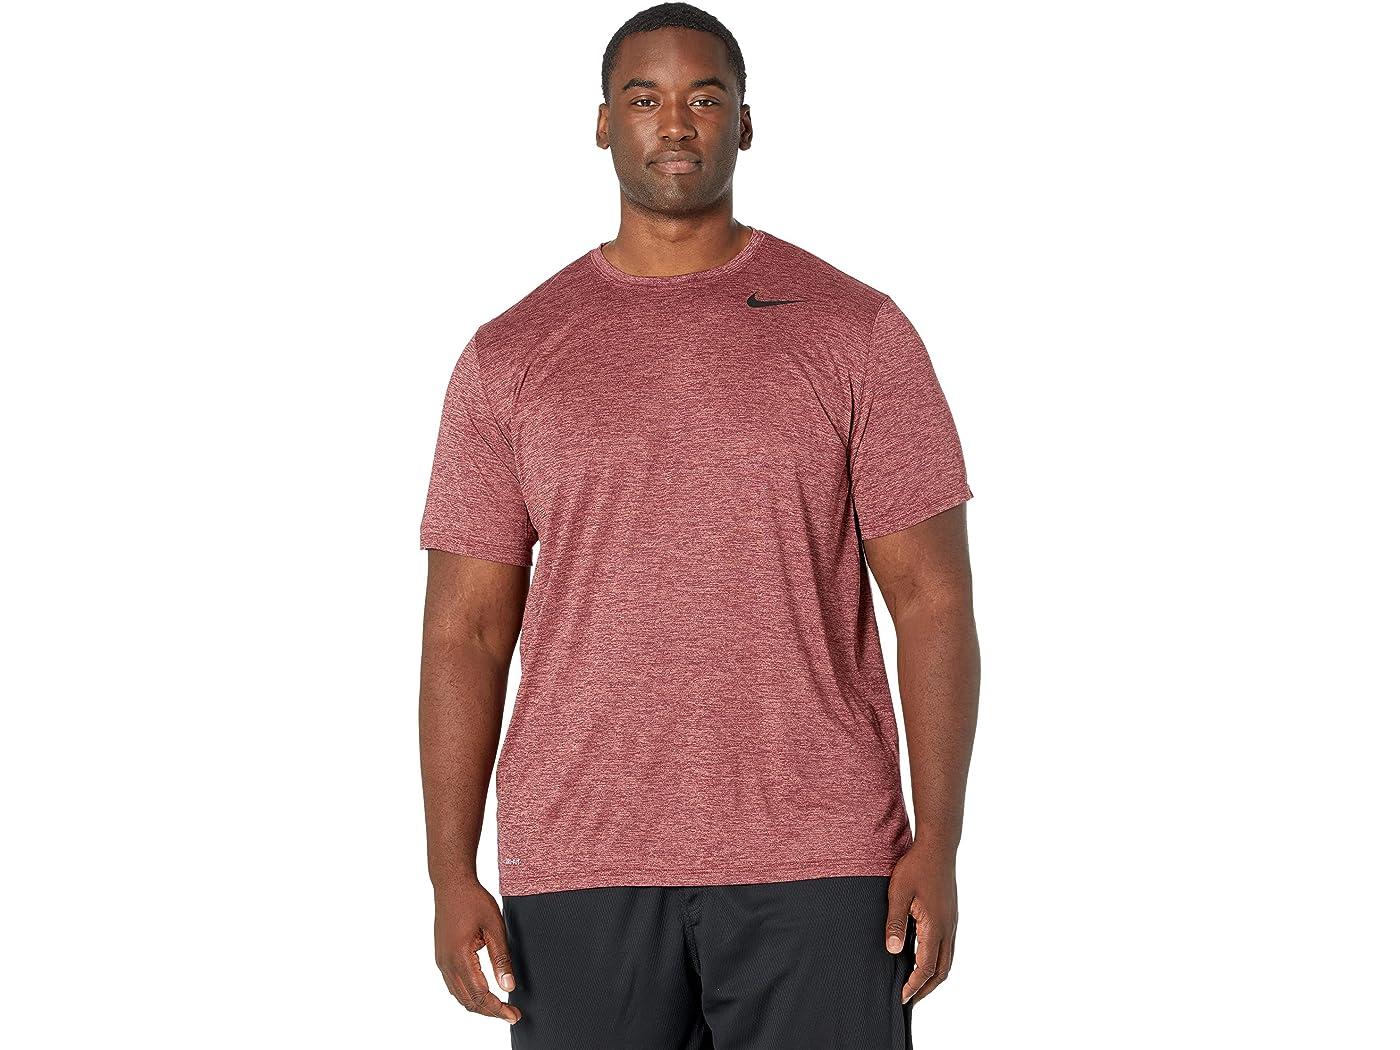 Nike Big & Tall Leg Tee Cross-Dye